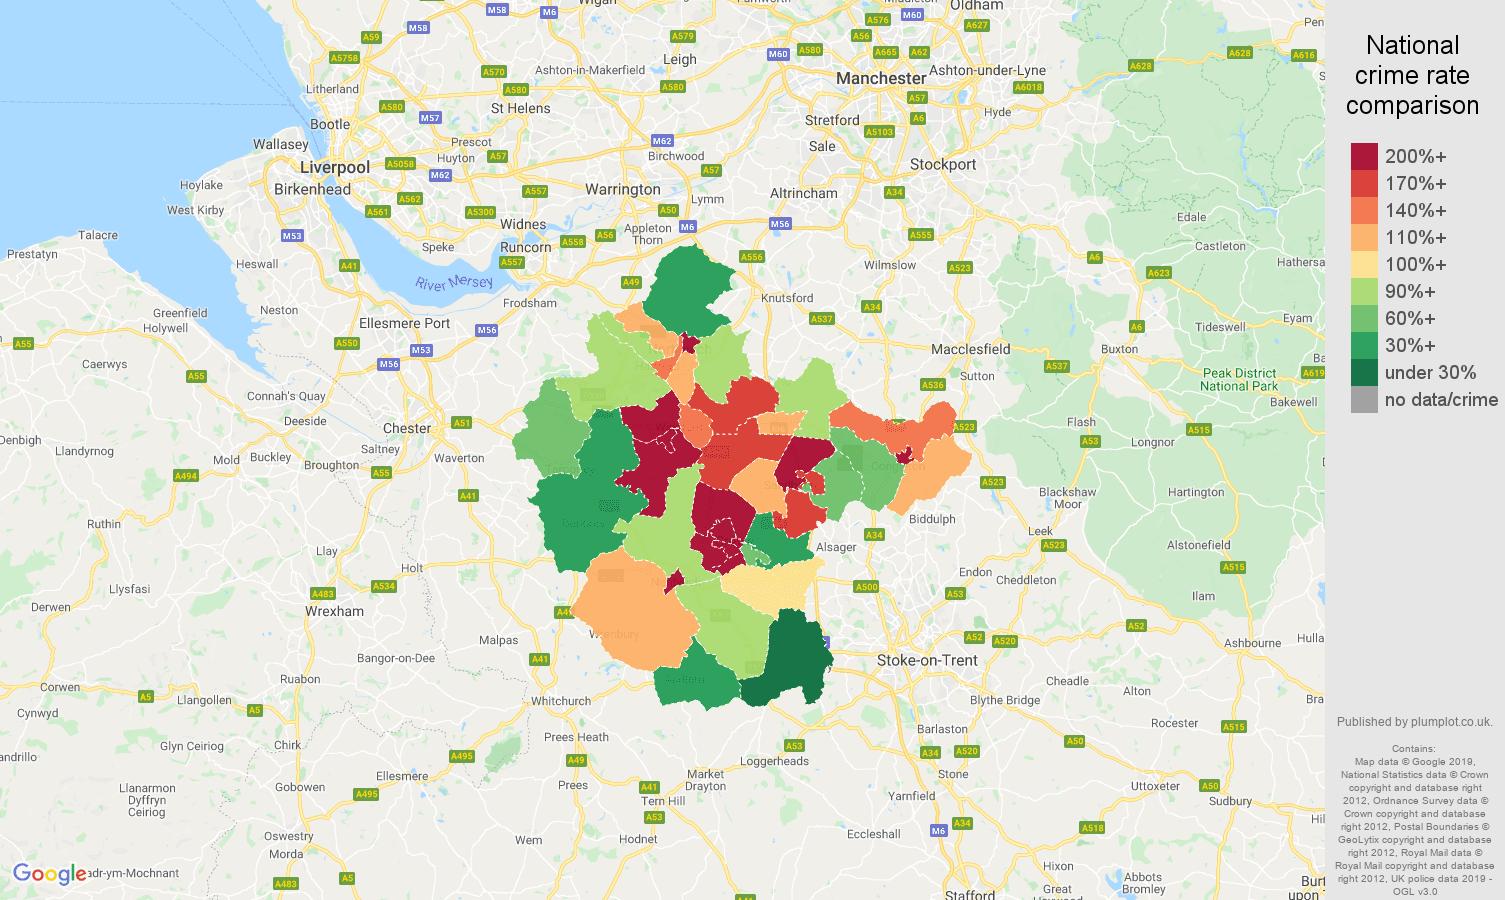 Crewe public order crime rate comparison map